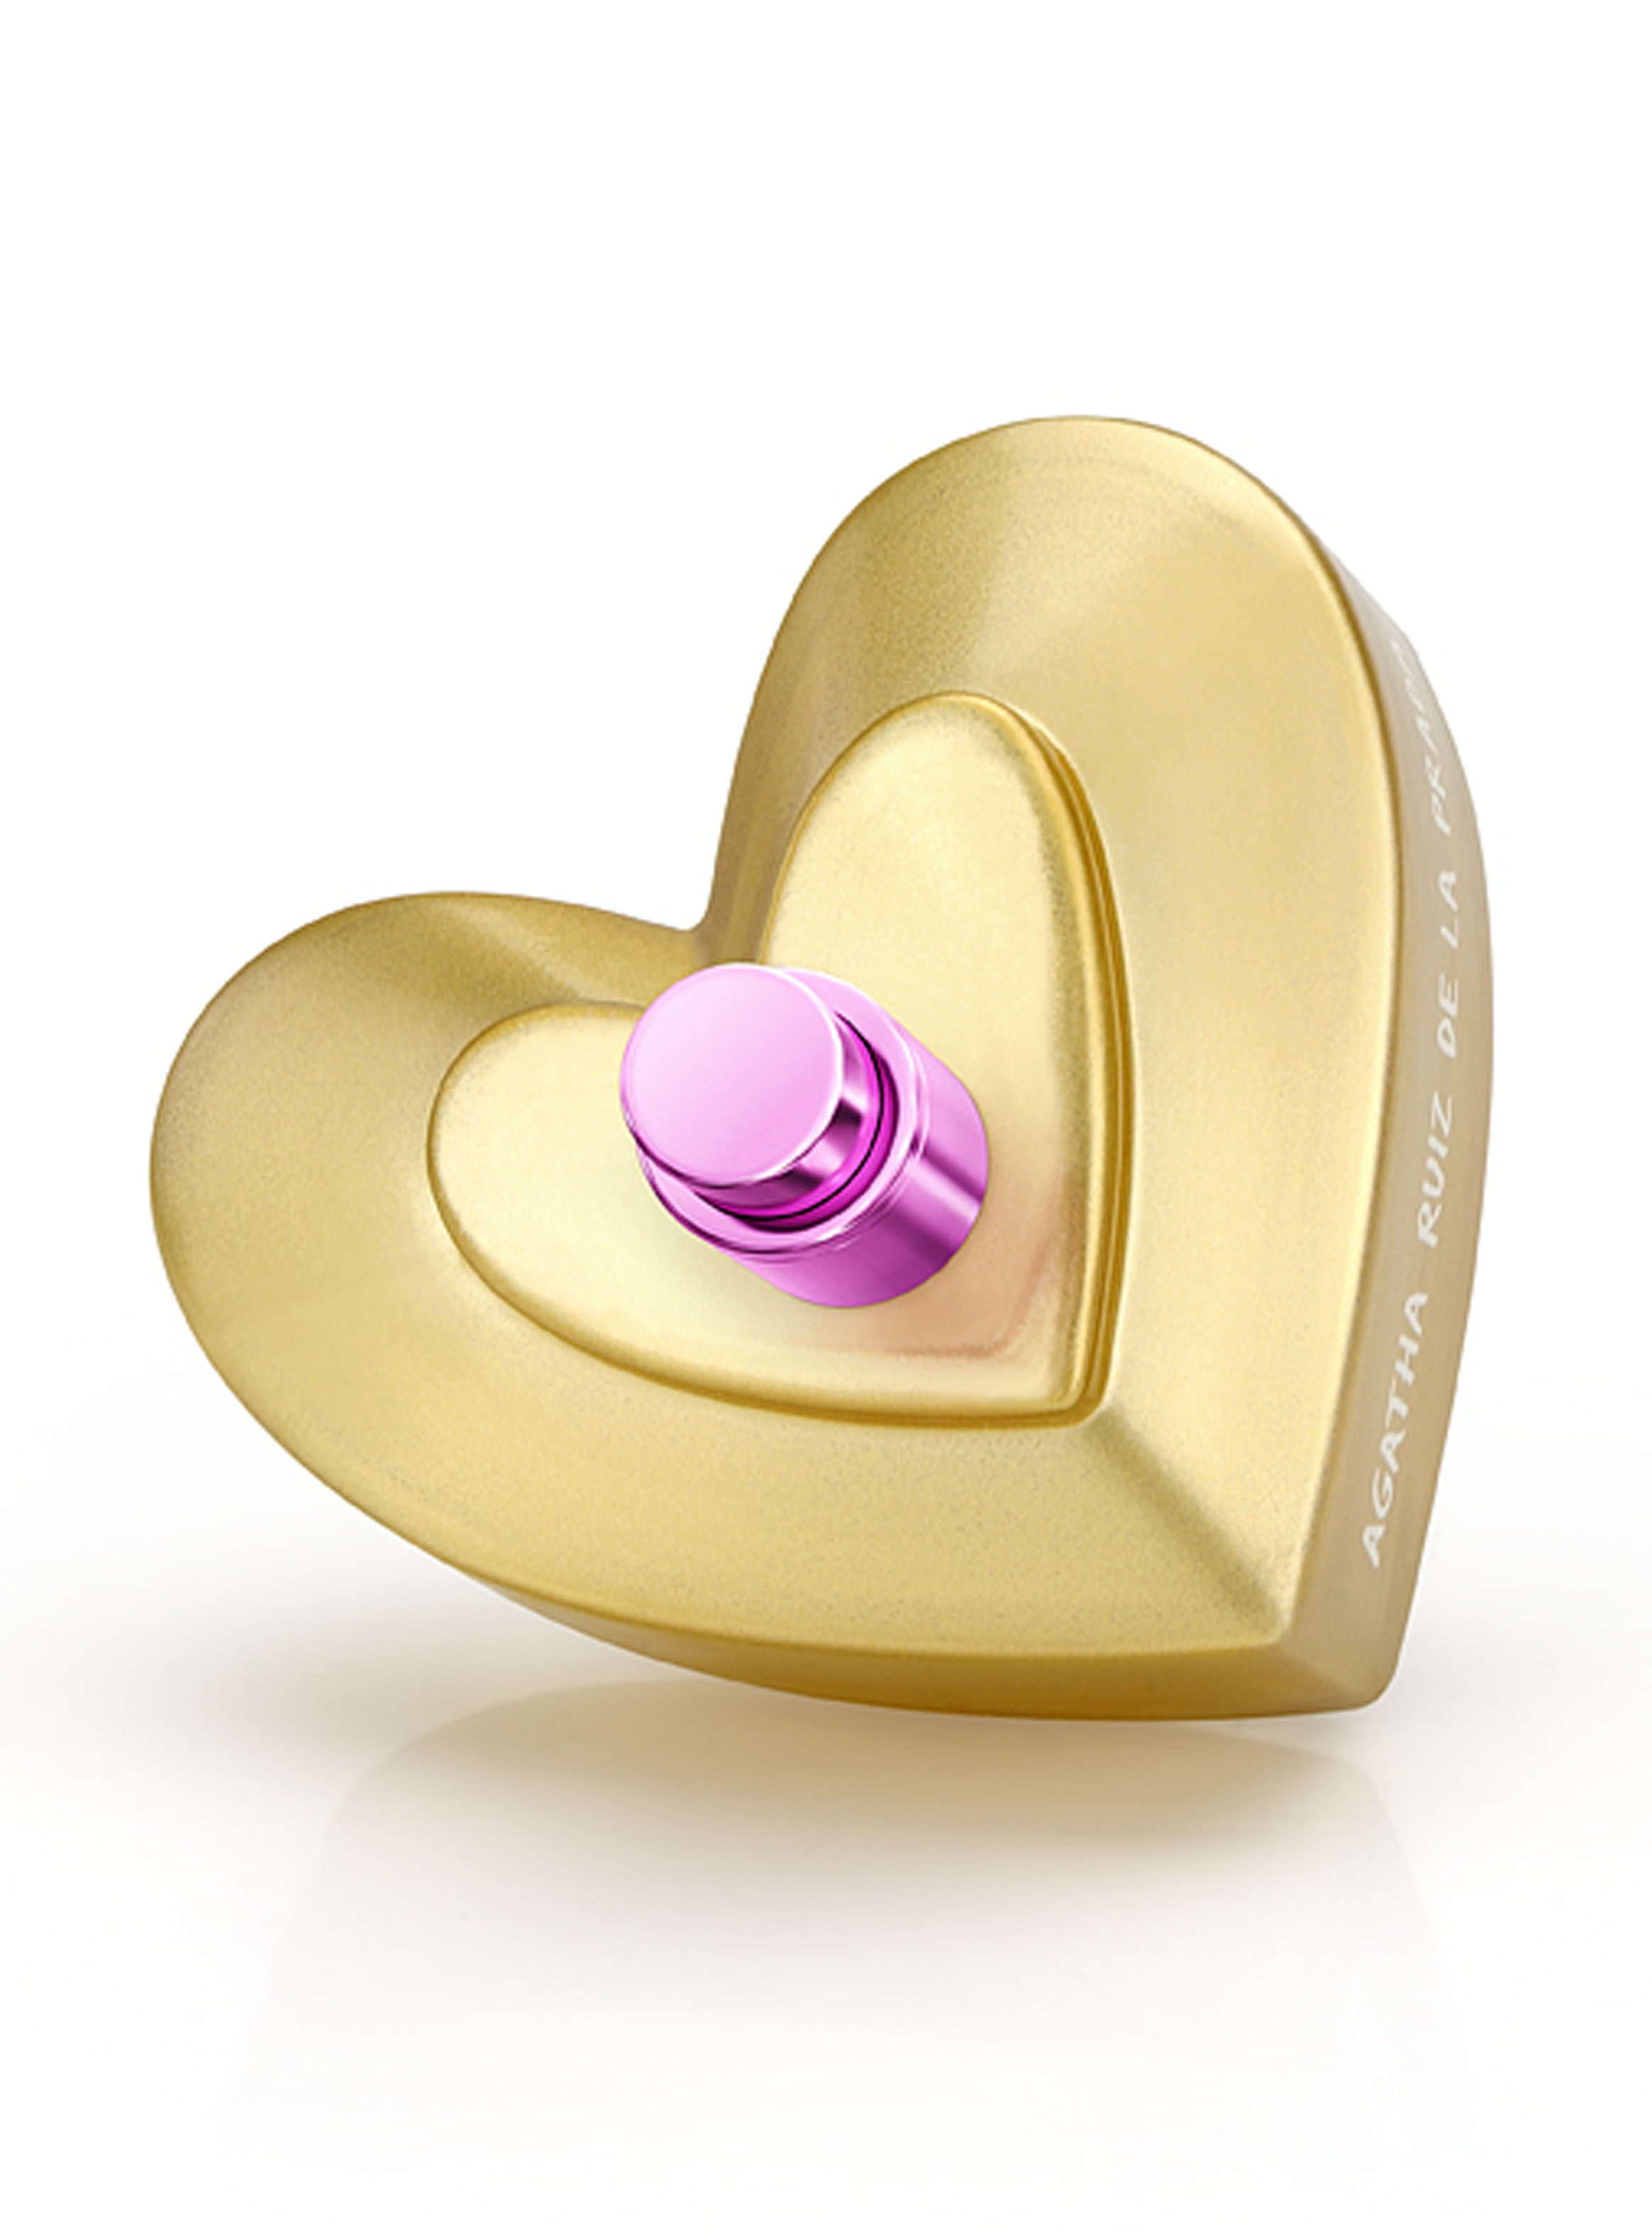 Perfume Glam Love Agatha Edt 80 De Ruiz Prada Ml Perfumes La rWrnqBxY